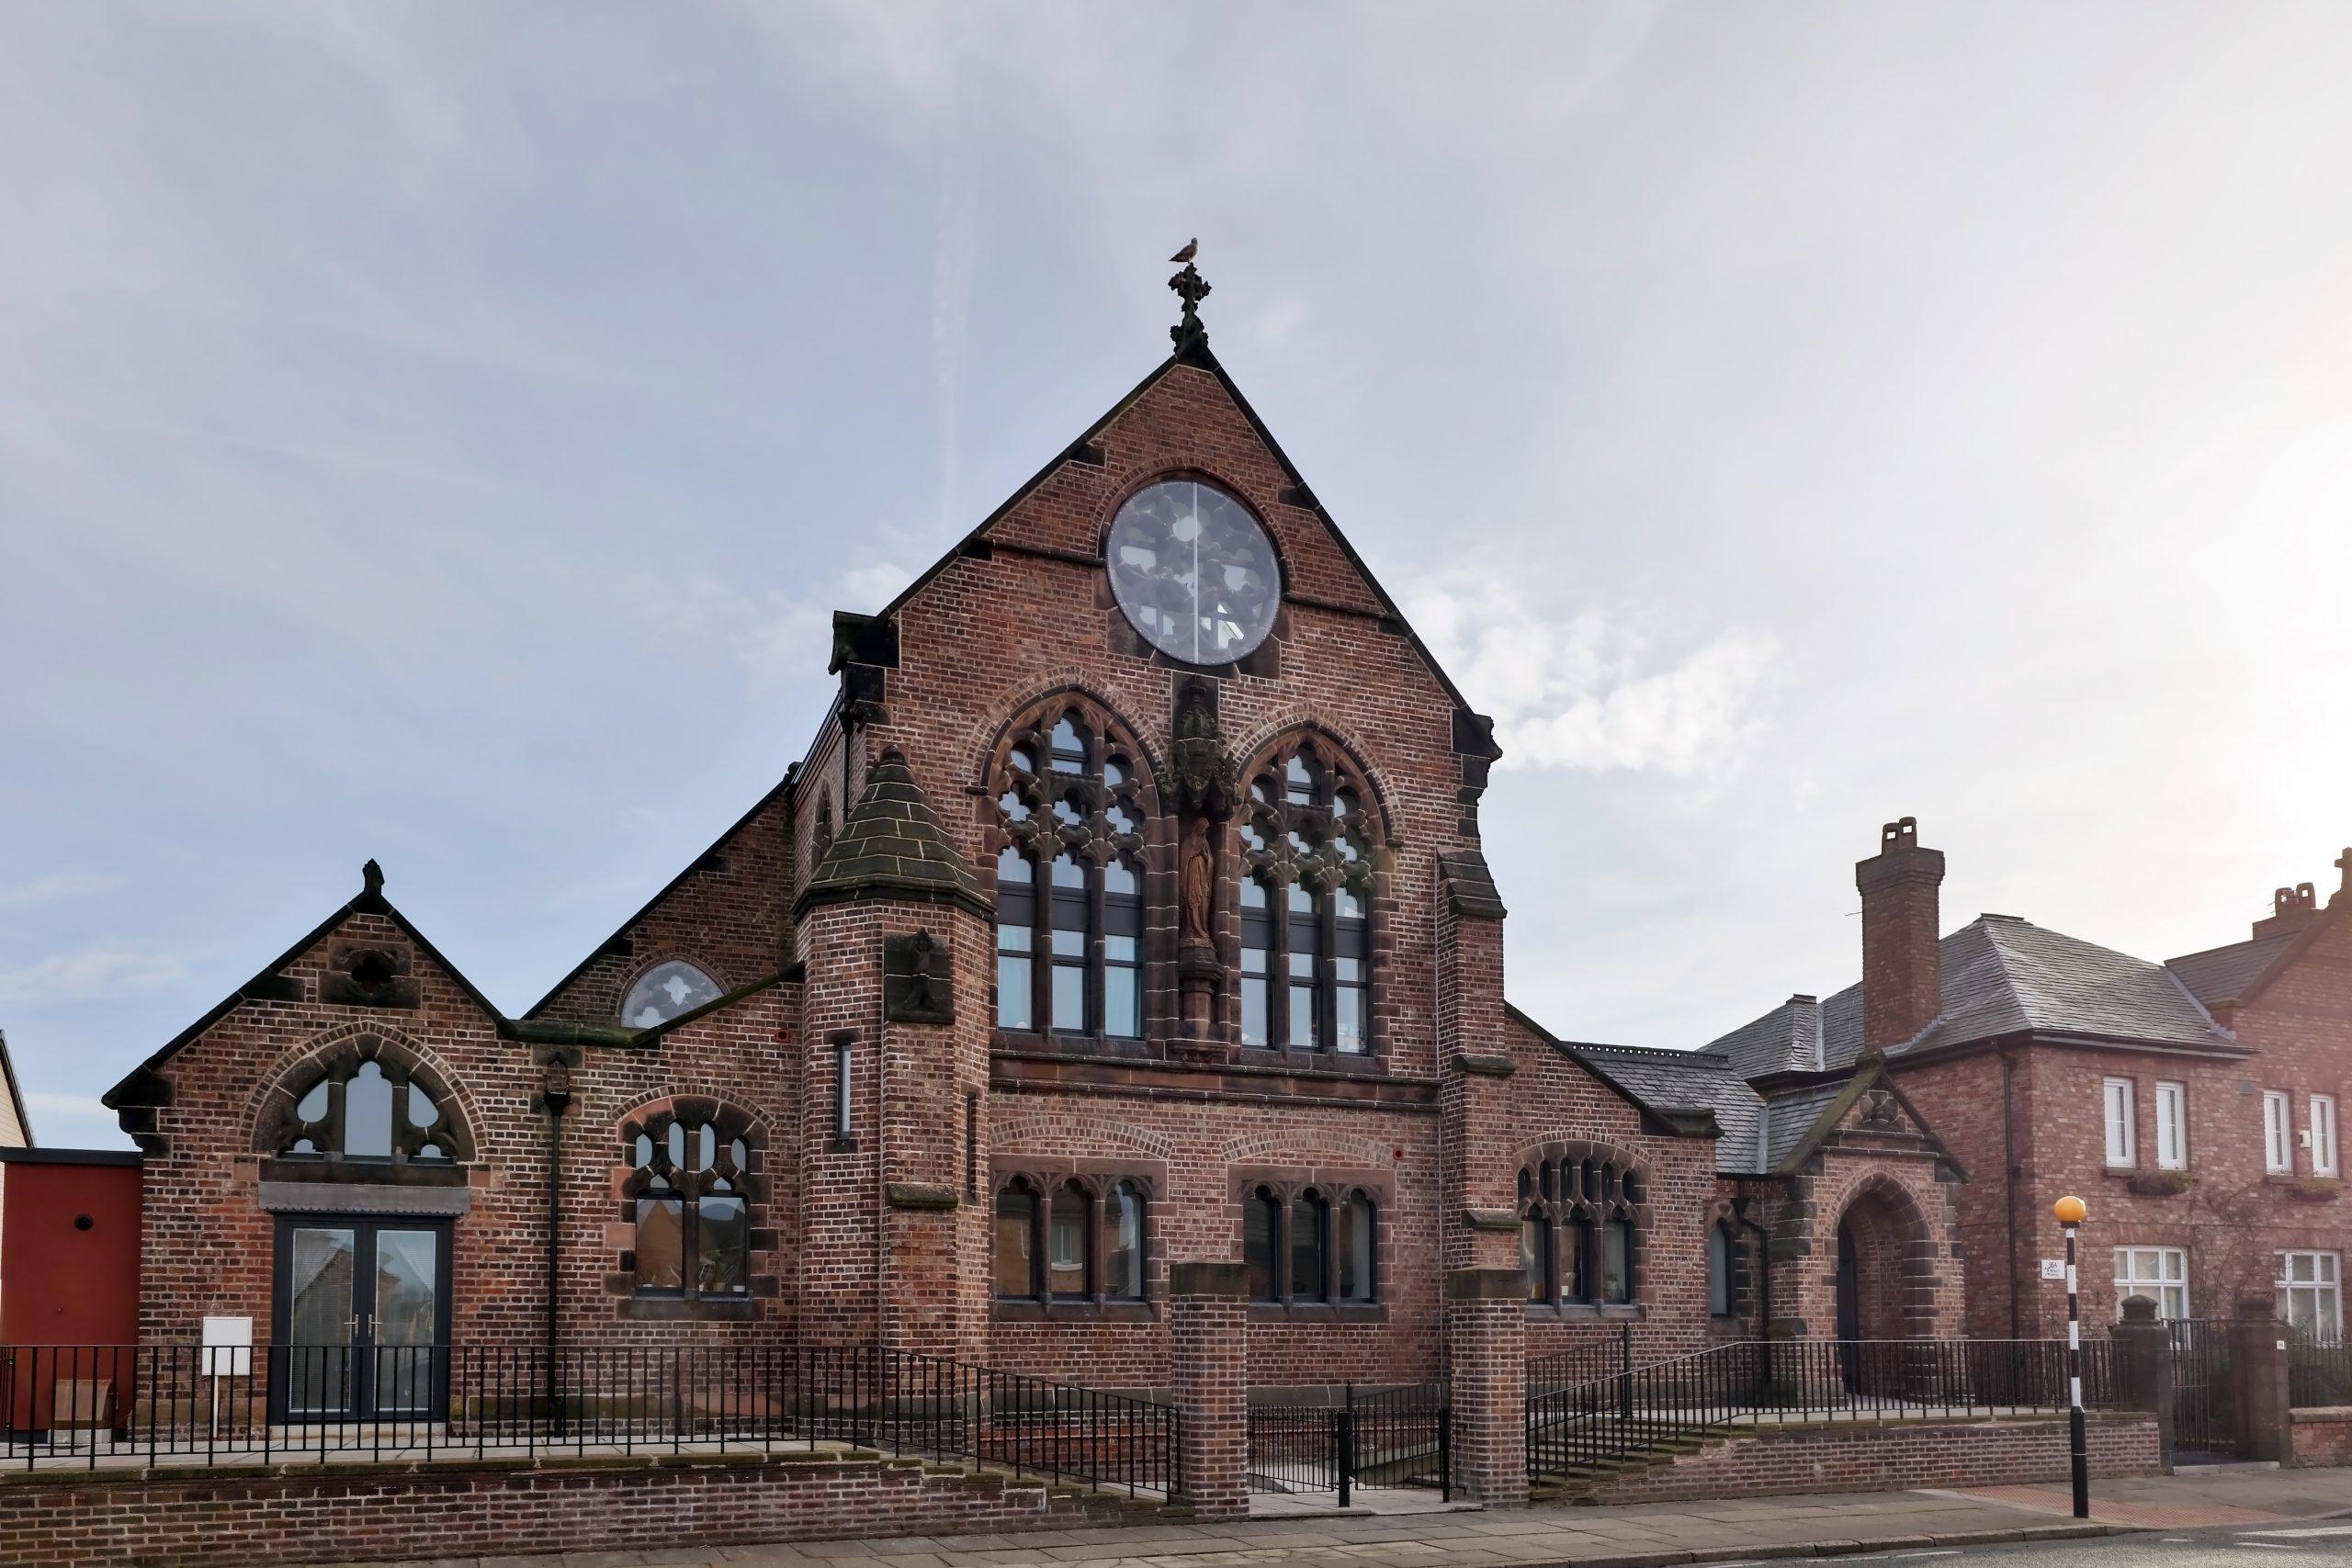 Kingsley Church Toxteth